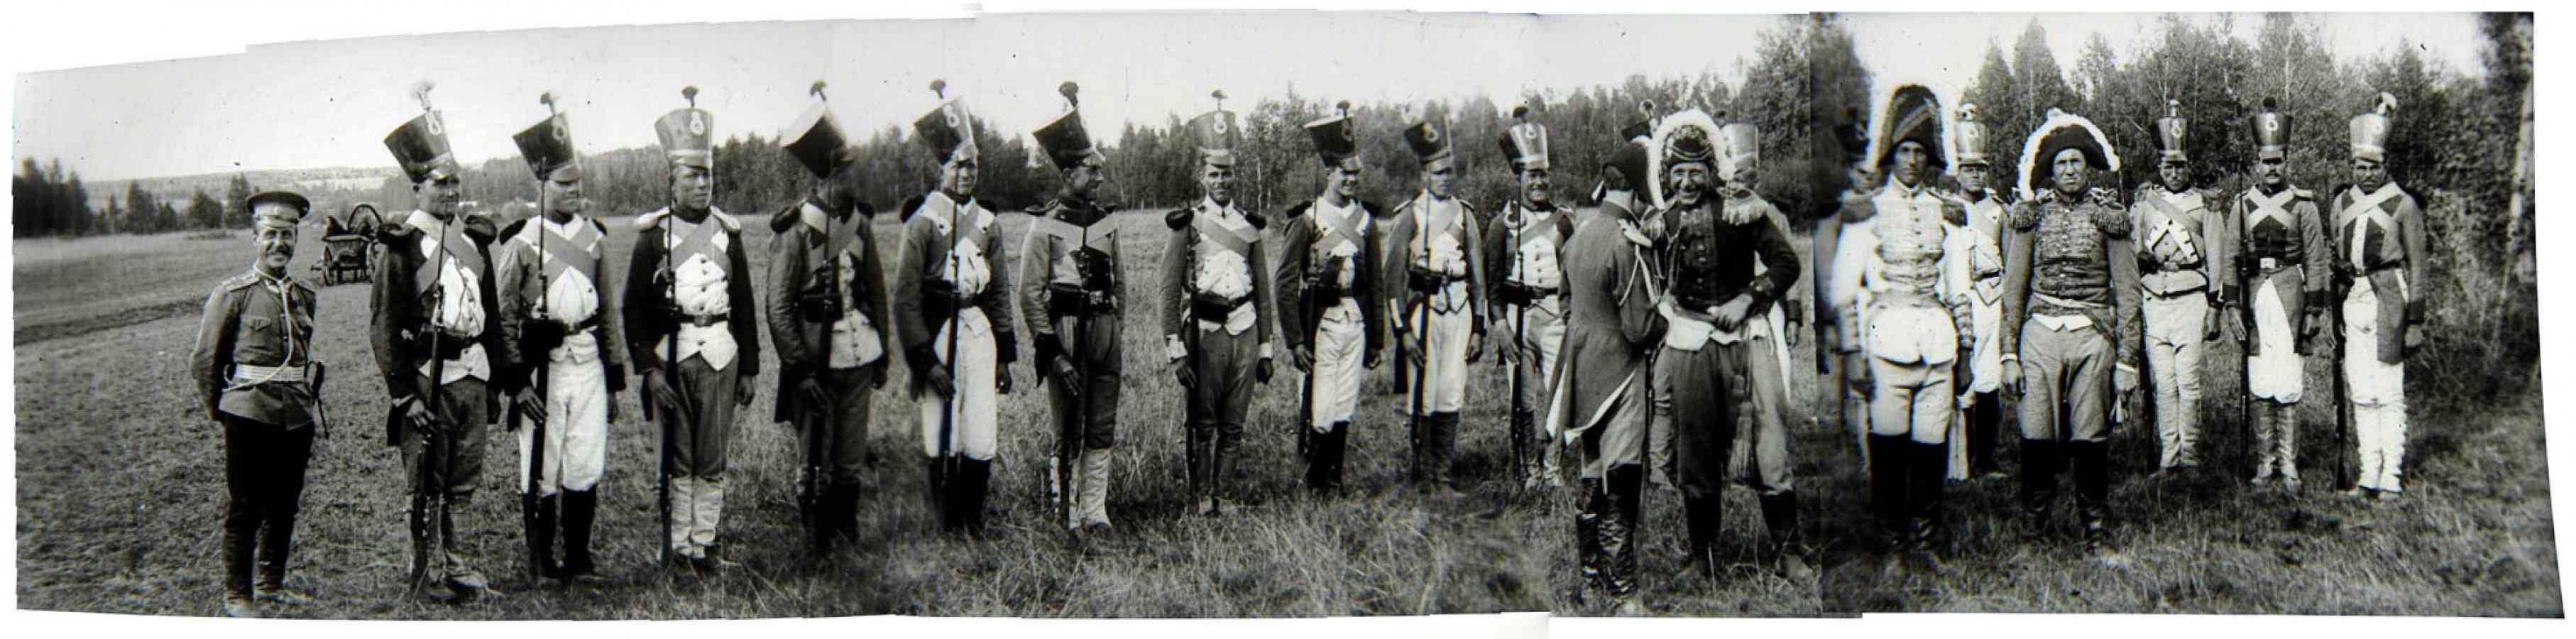 Le centenaire de 1812 en Russie 1264410